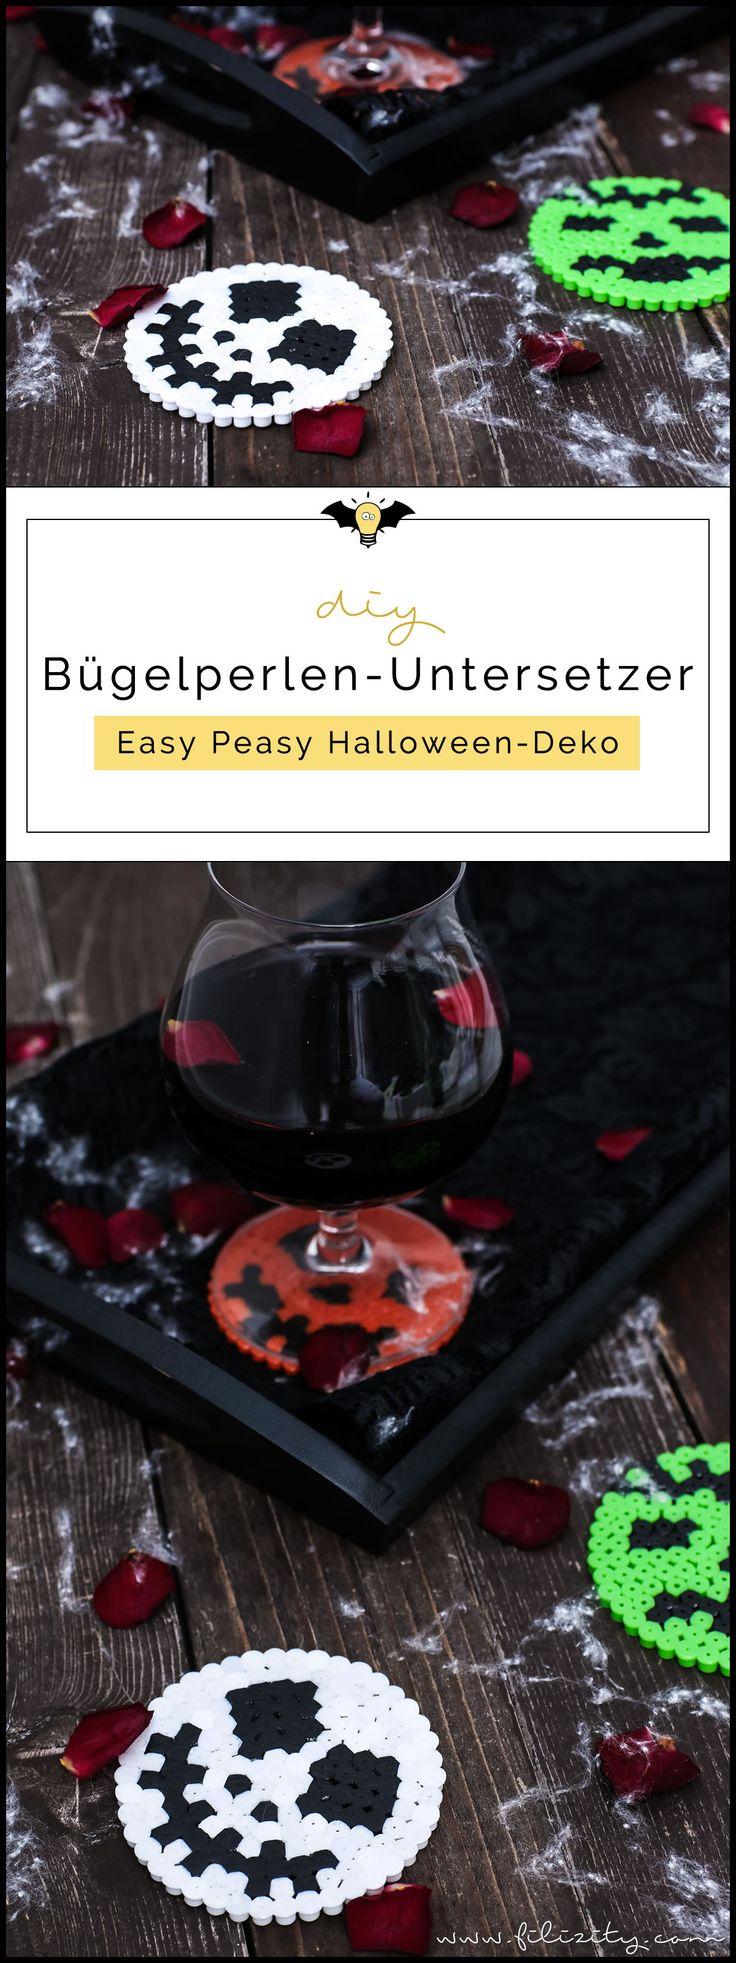 Halloween Deko selber machen: Bügelperlen-Glasuntersetzer